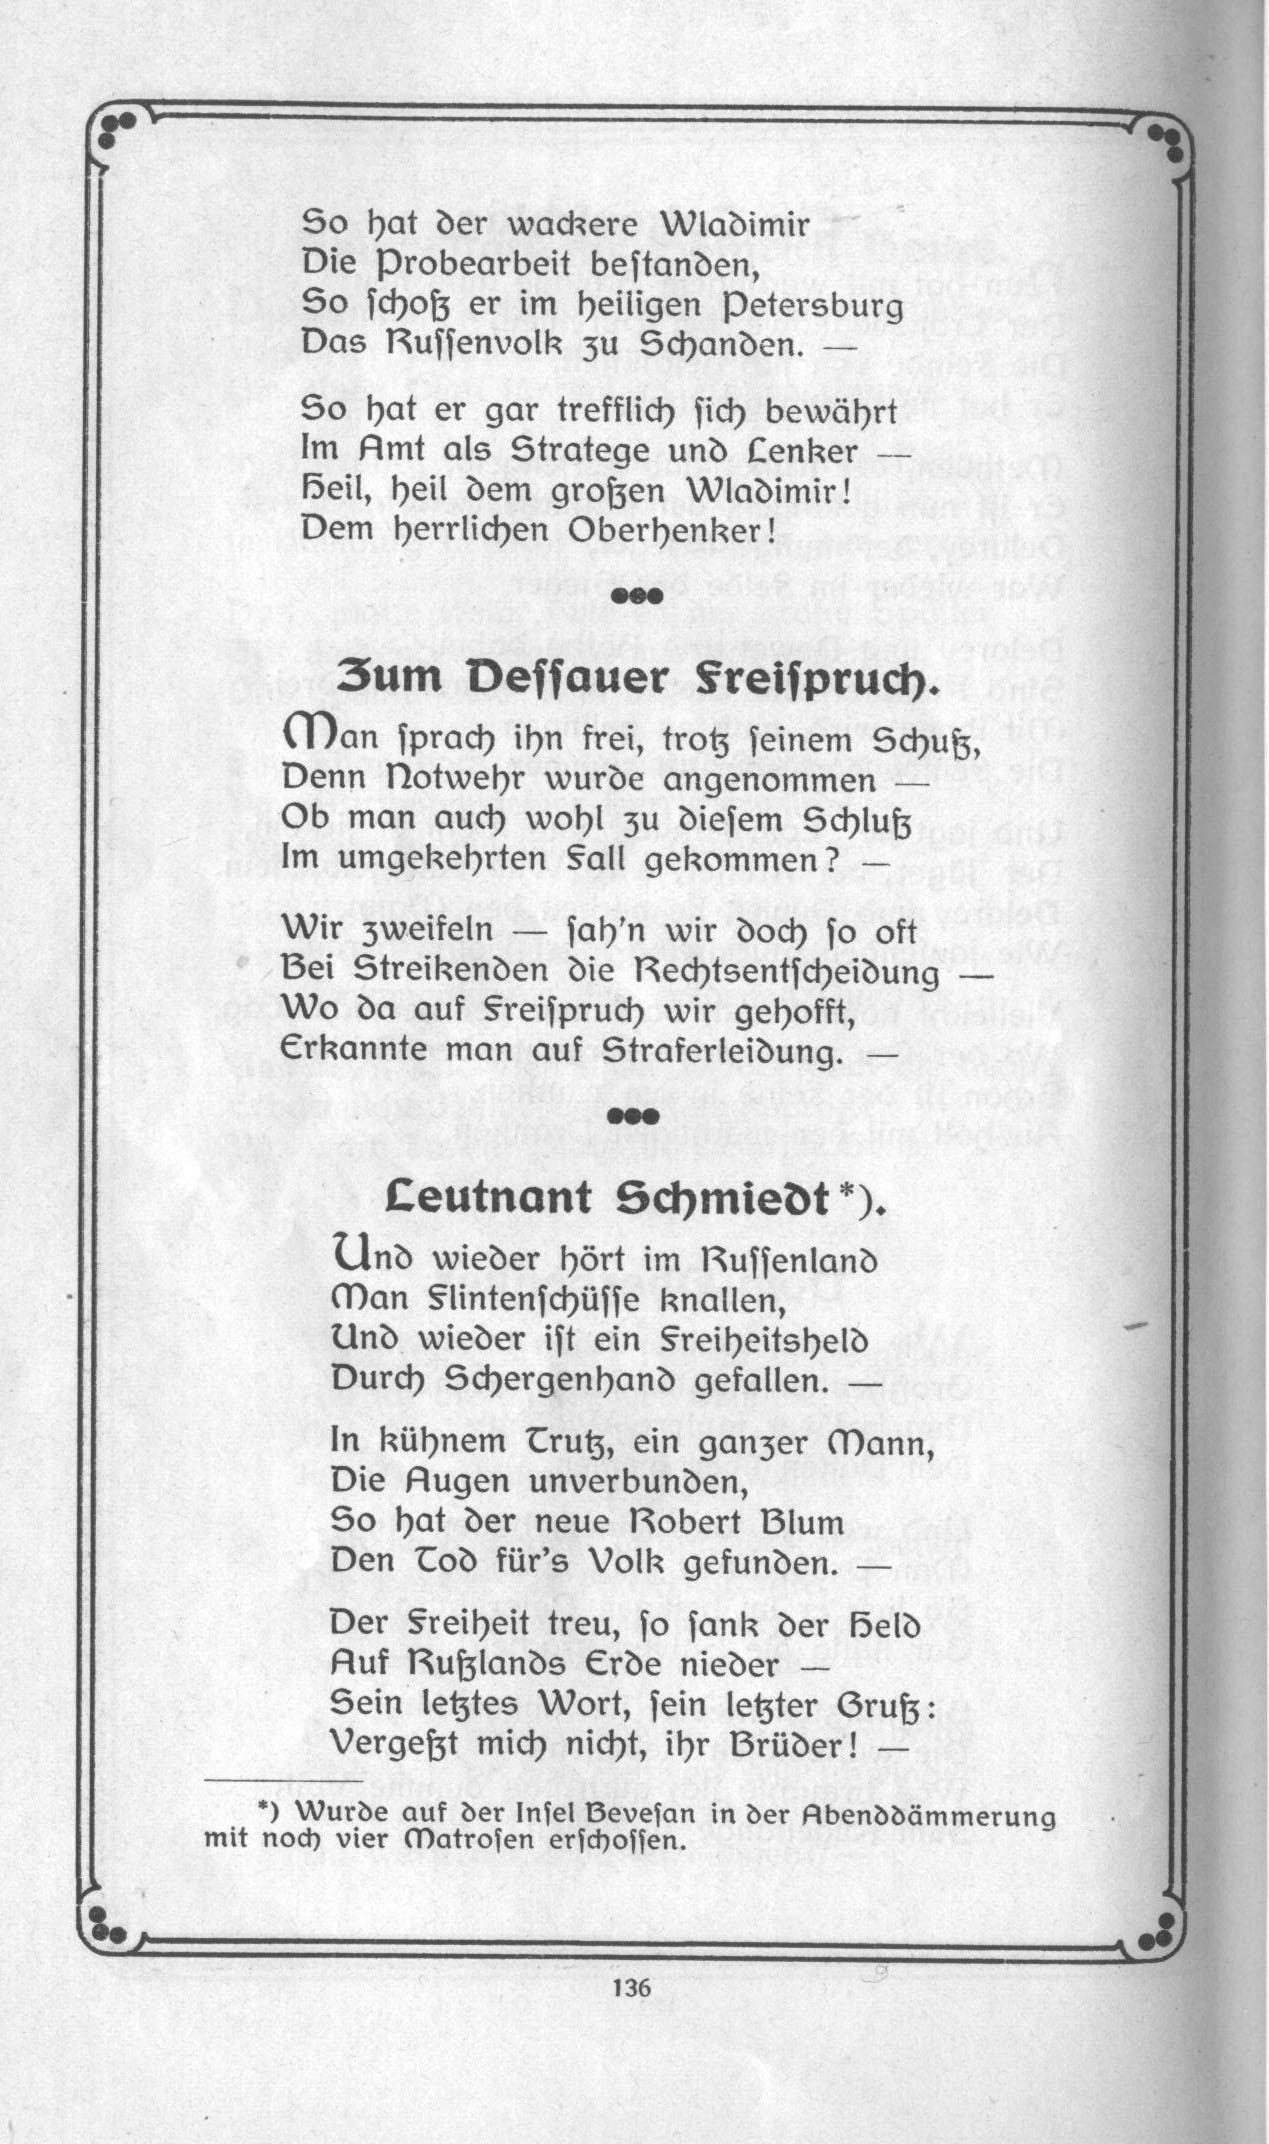 File:Was Die Ruhr Mir Sang (Kämpchen) 136.jpg - Wikimedia Commons